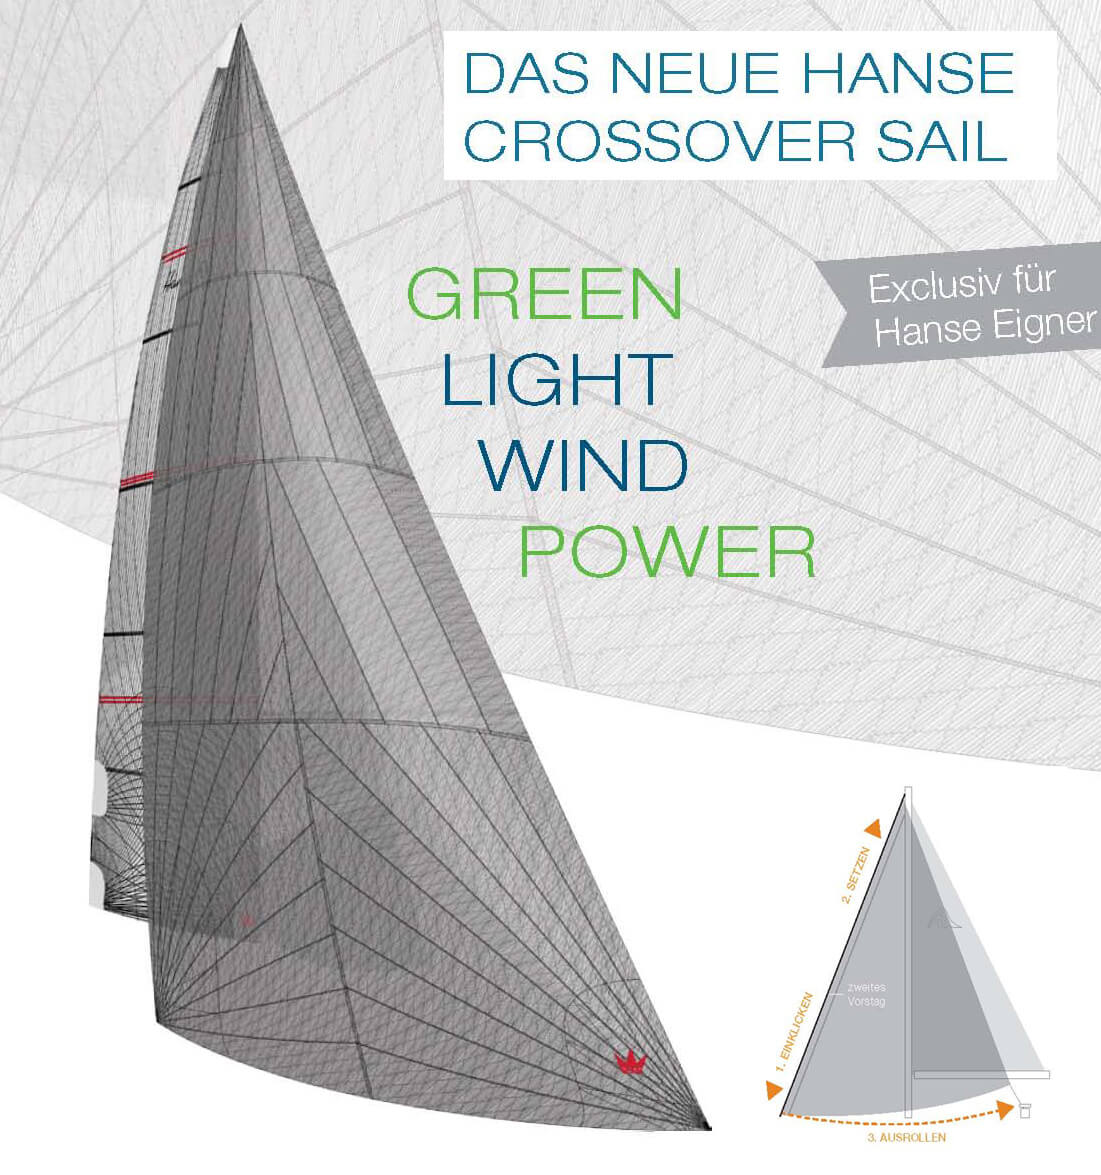 hanse-crossover-sail